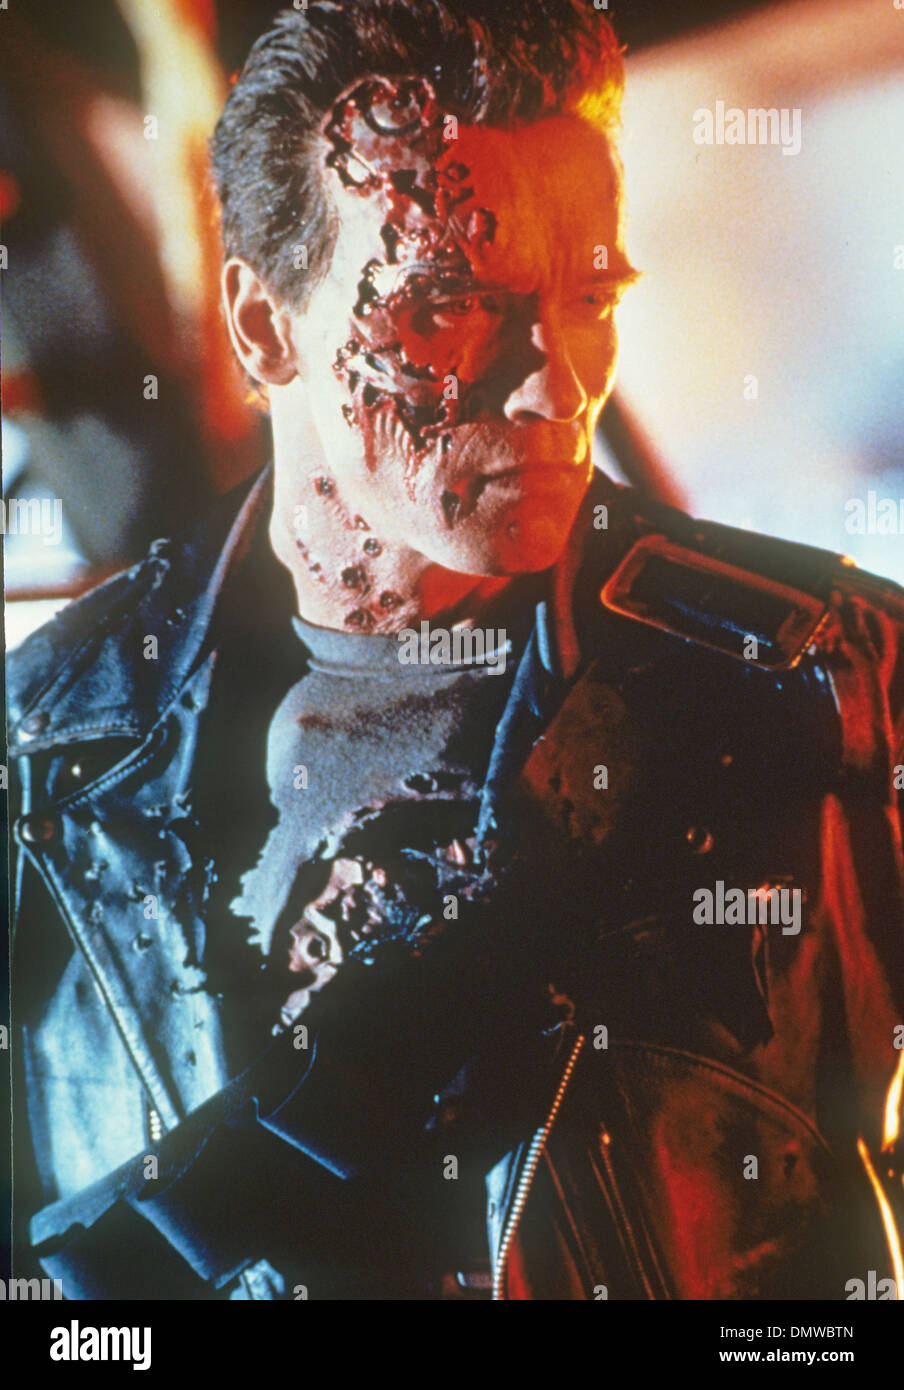 TERMINATOR 2: JUDGEMENT DAY  1991 TriStar film with Arnold Schwarzenegger - Stock Image